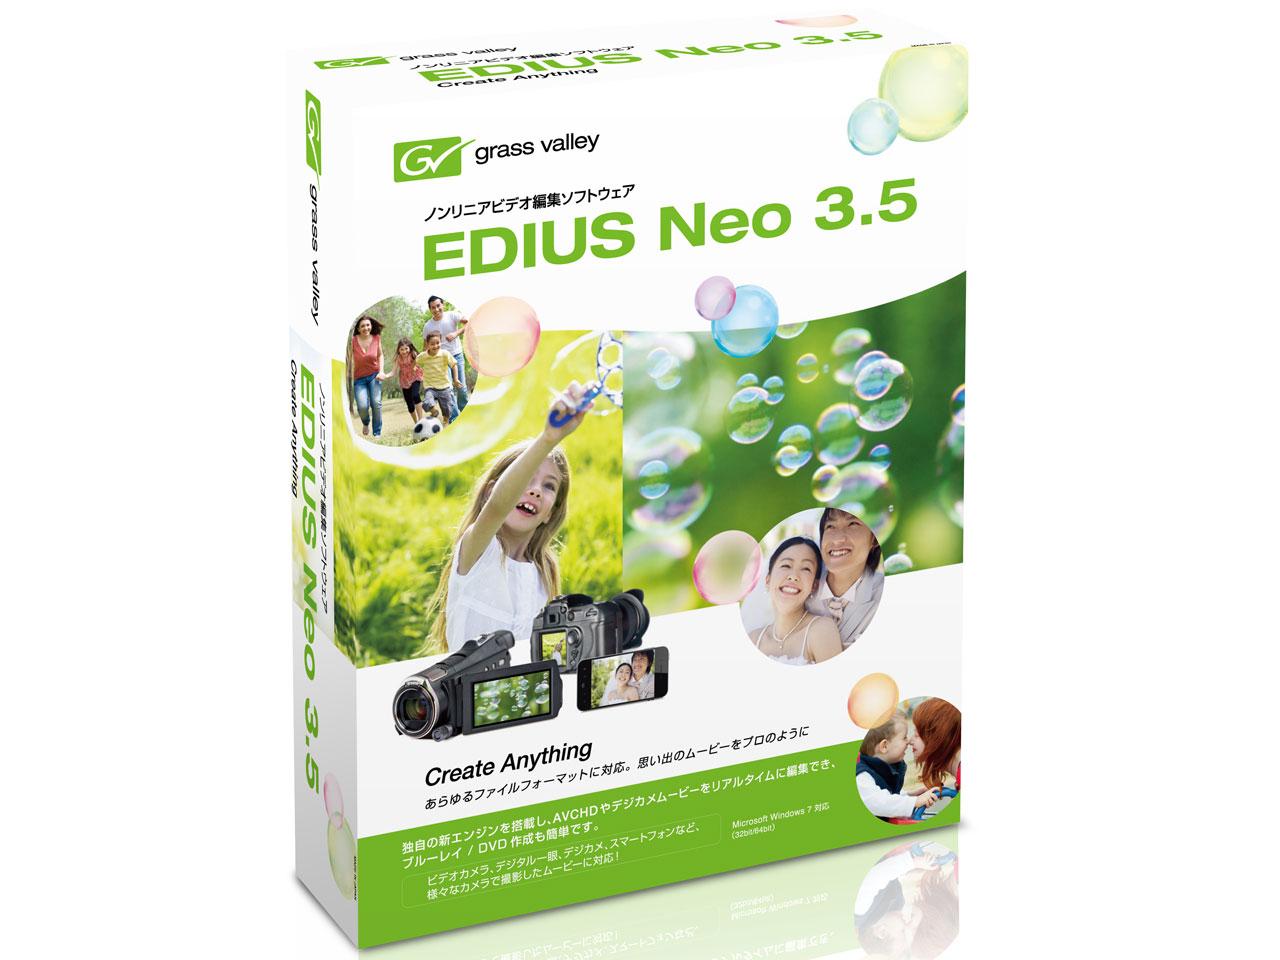 EDIUS Neo 3.5 の製品画像